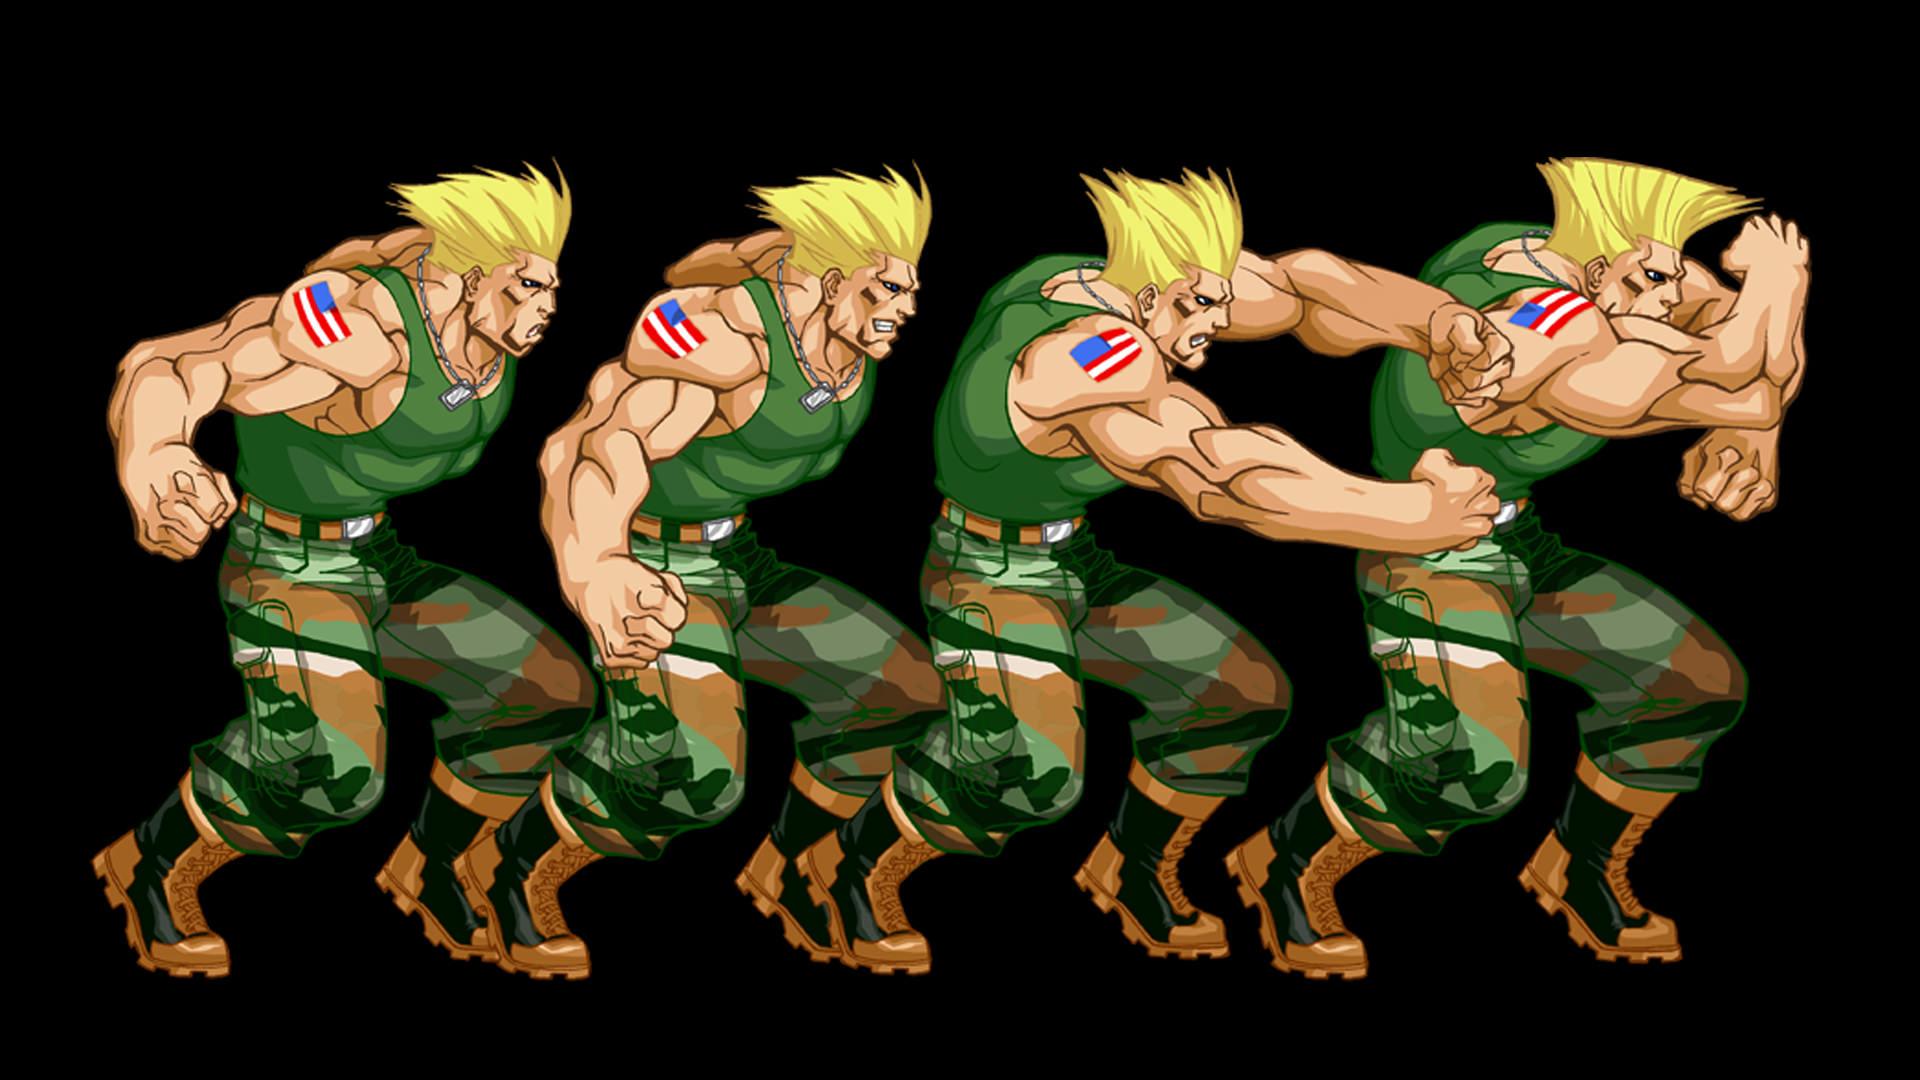 Capcom - Street Fighter - Guile